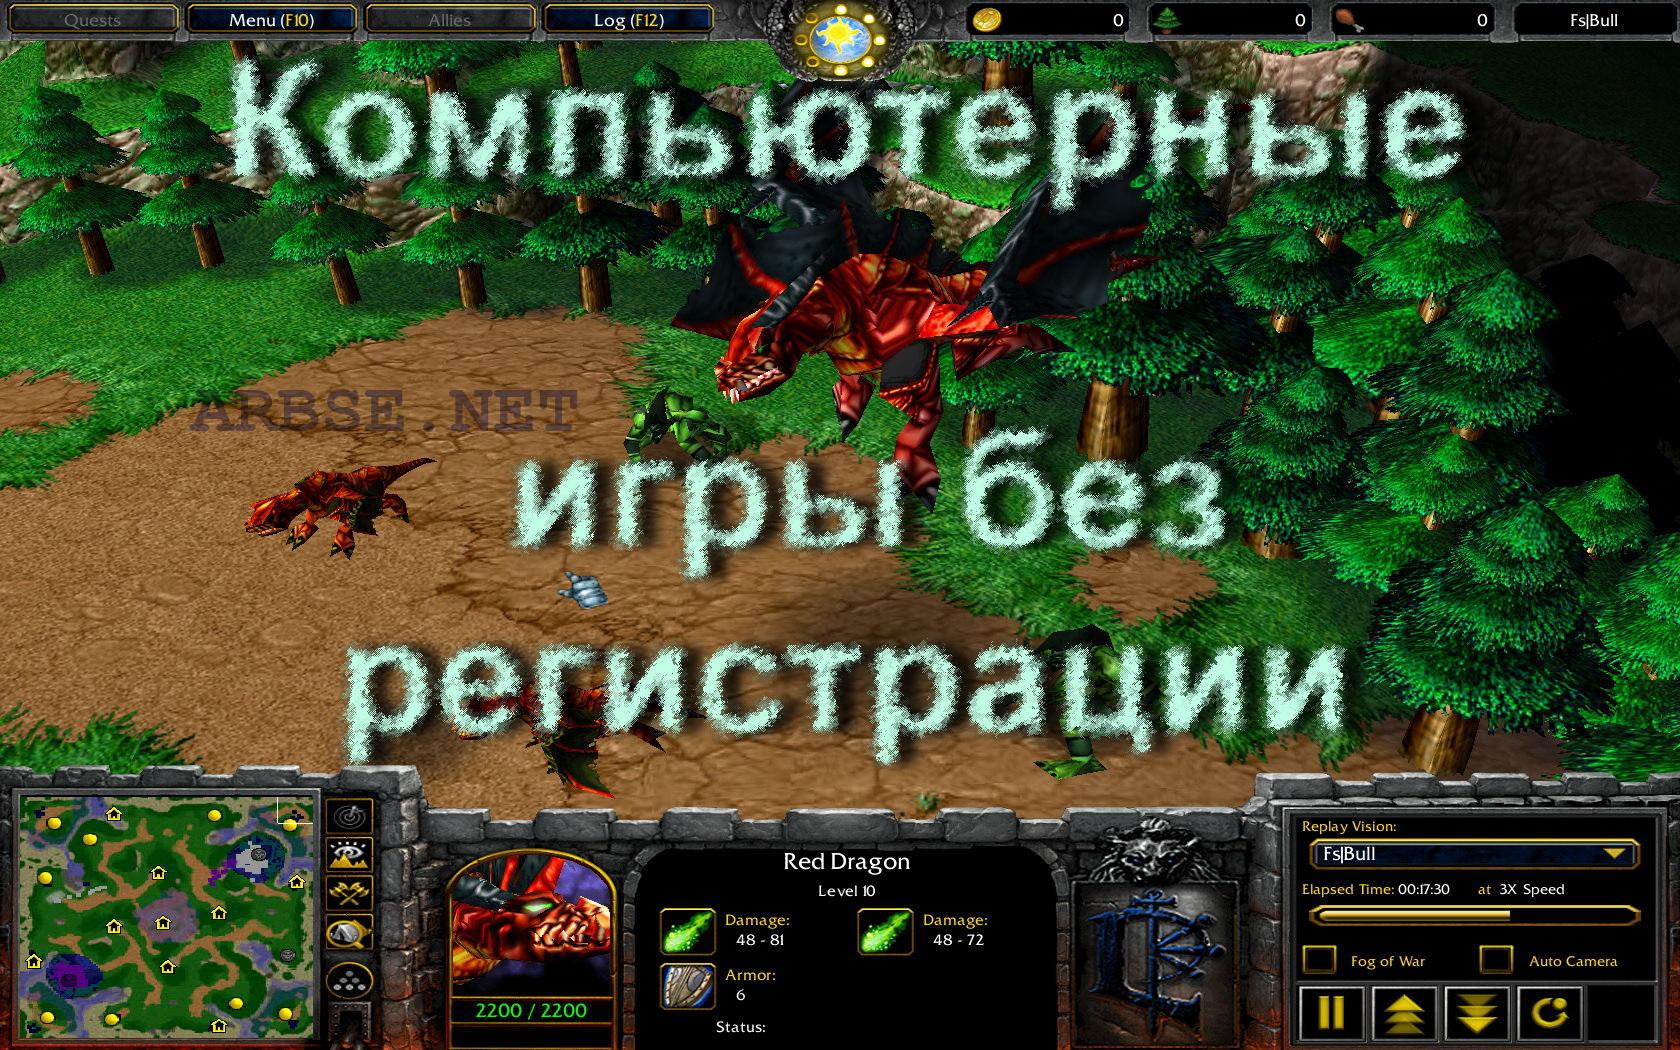 Обзор Diablo - ARBSE